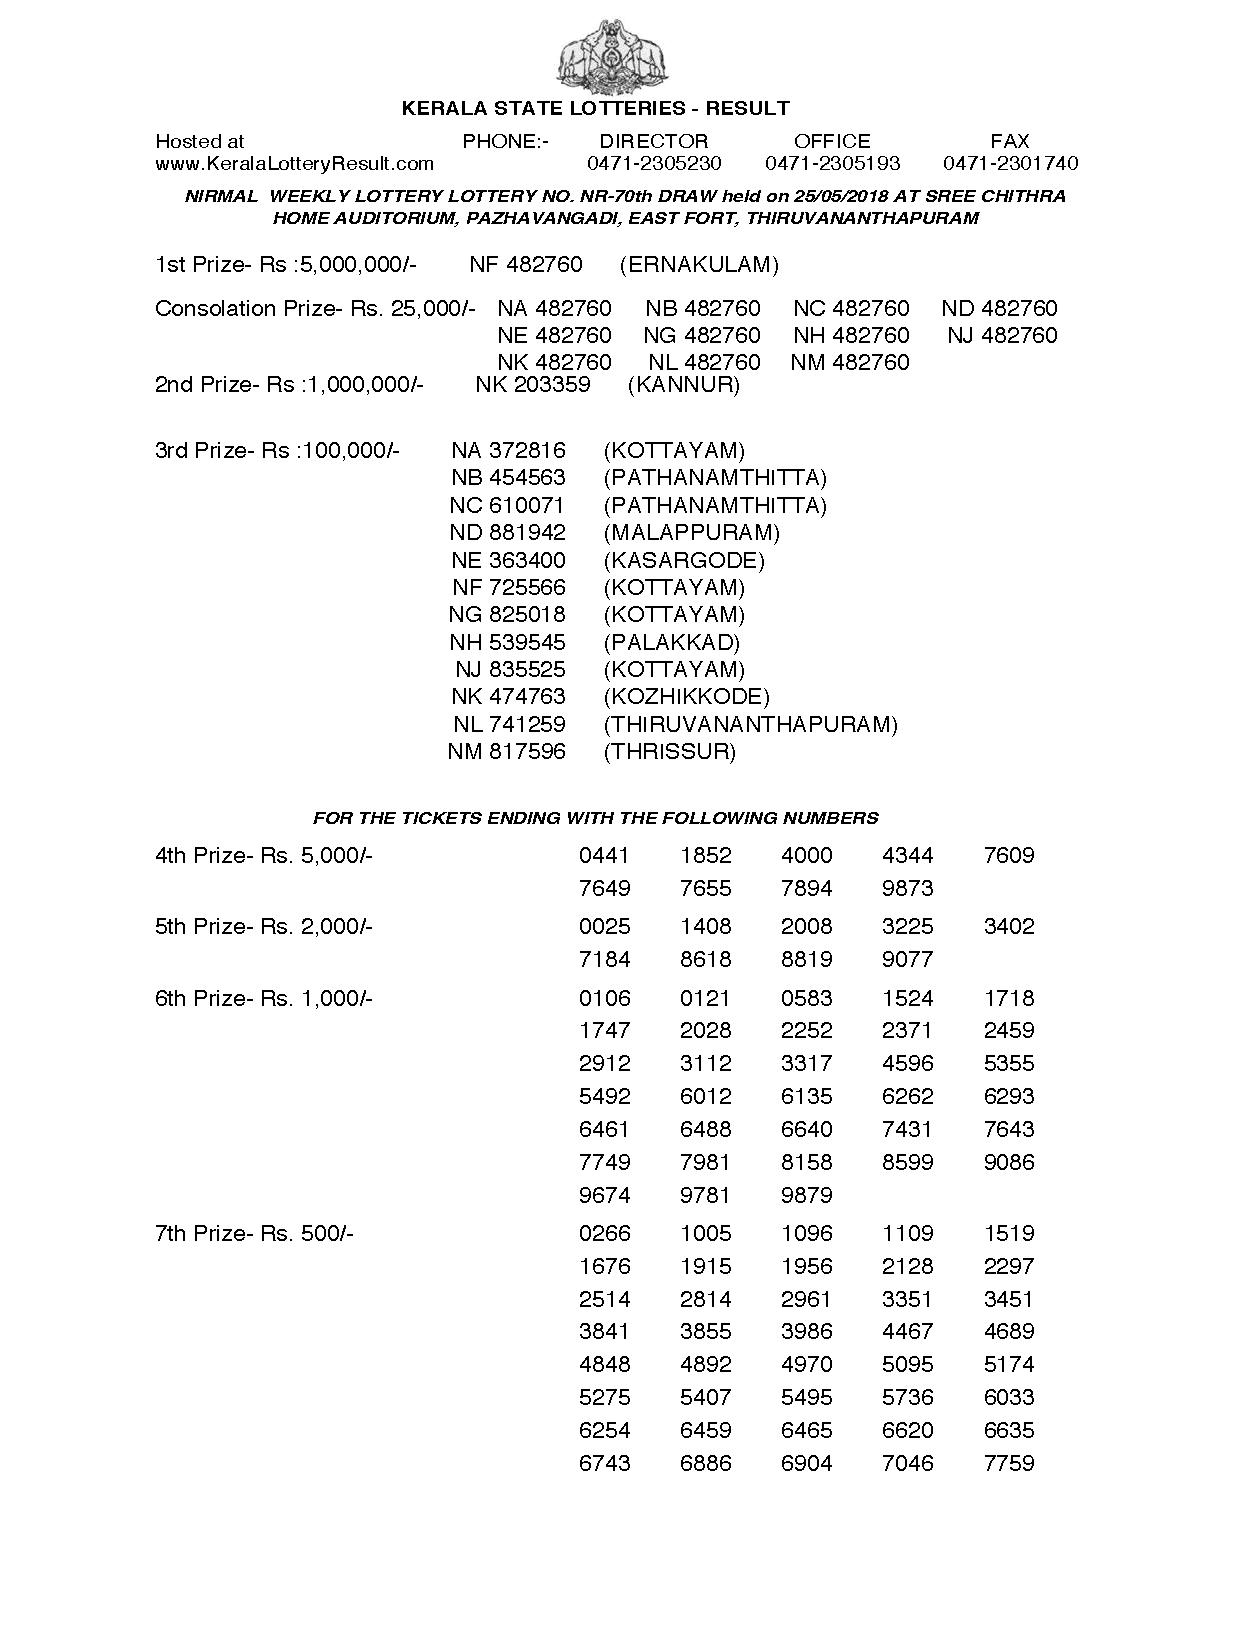 Nirmal NR70 Kerala Lottery Results Screenshot: Page 1